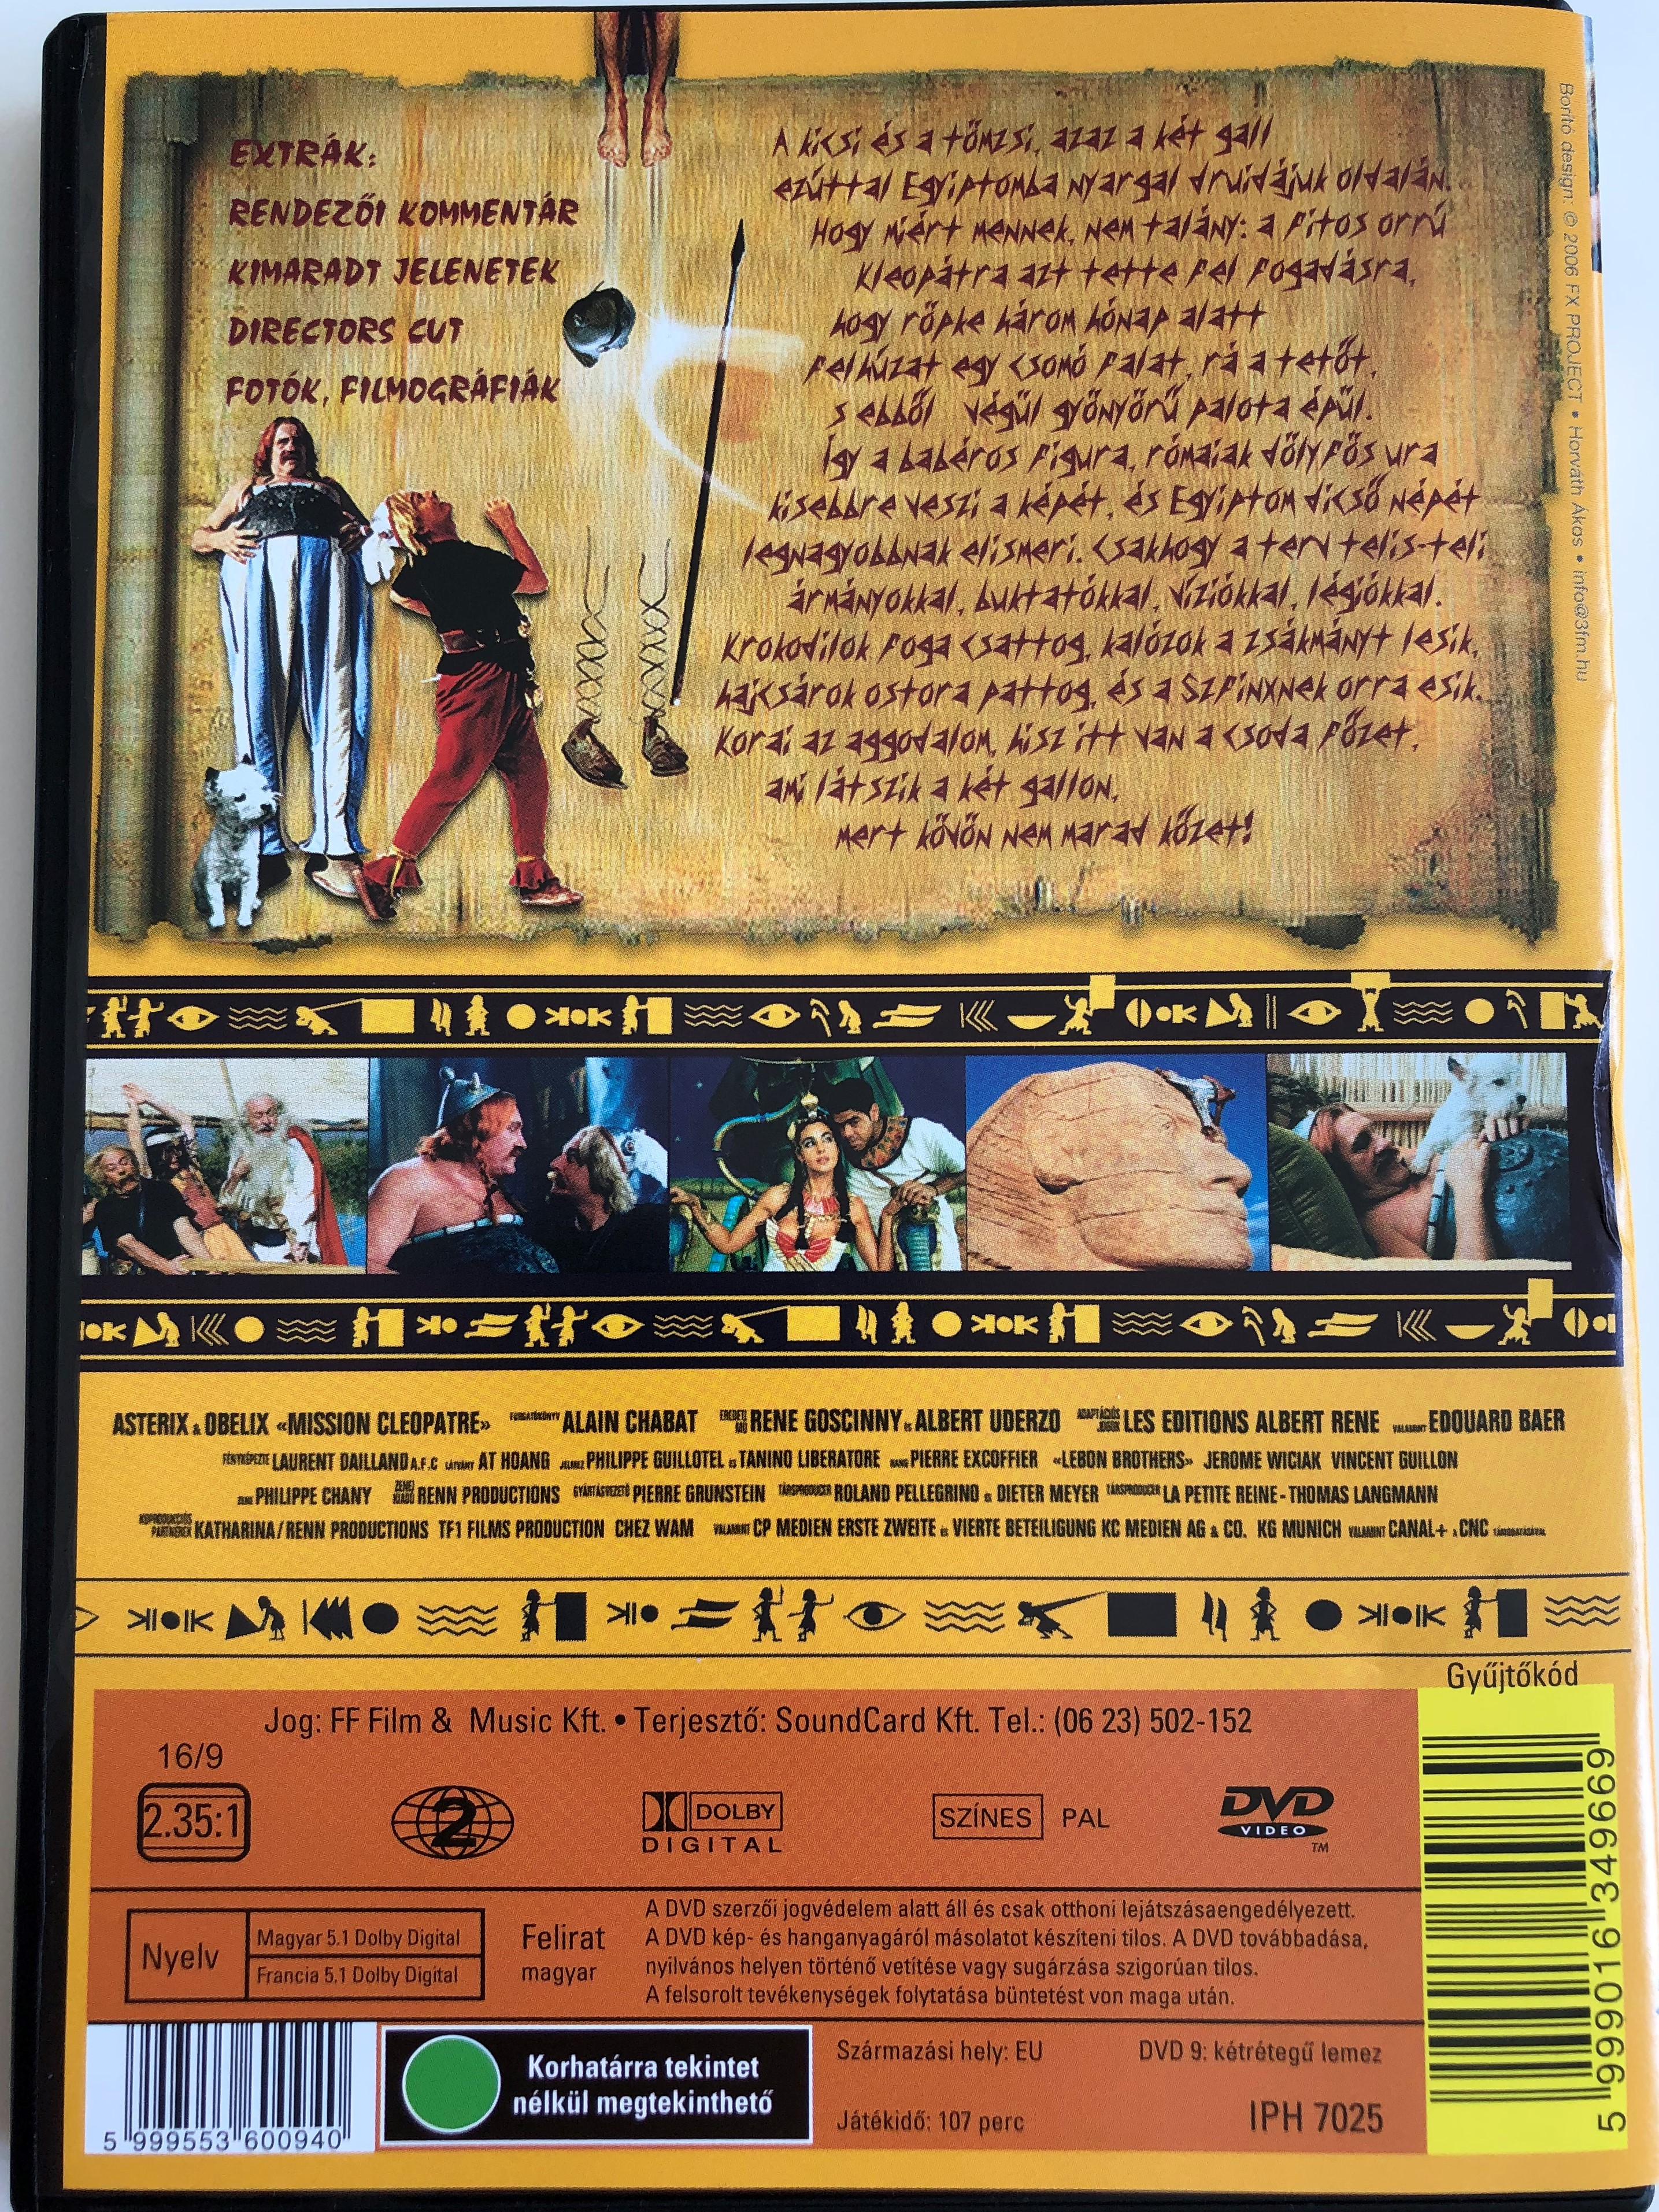 ast-rix-et-ob-lix-mission-cl-op-tre-dvd-2002-asterix-obelix-a-kleop-tra-k-ldet-s-asterix-obelix-mission-cleopatra-directed-by-alain-chabat-starring-g-rard-depardieu-christian-clavier-jamel-debbouze-alain-chabat-.jpg